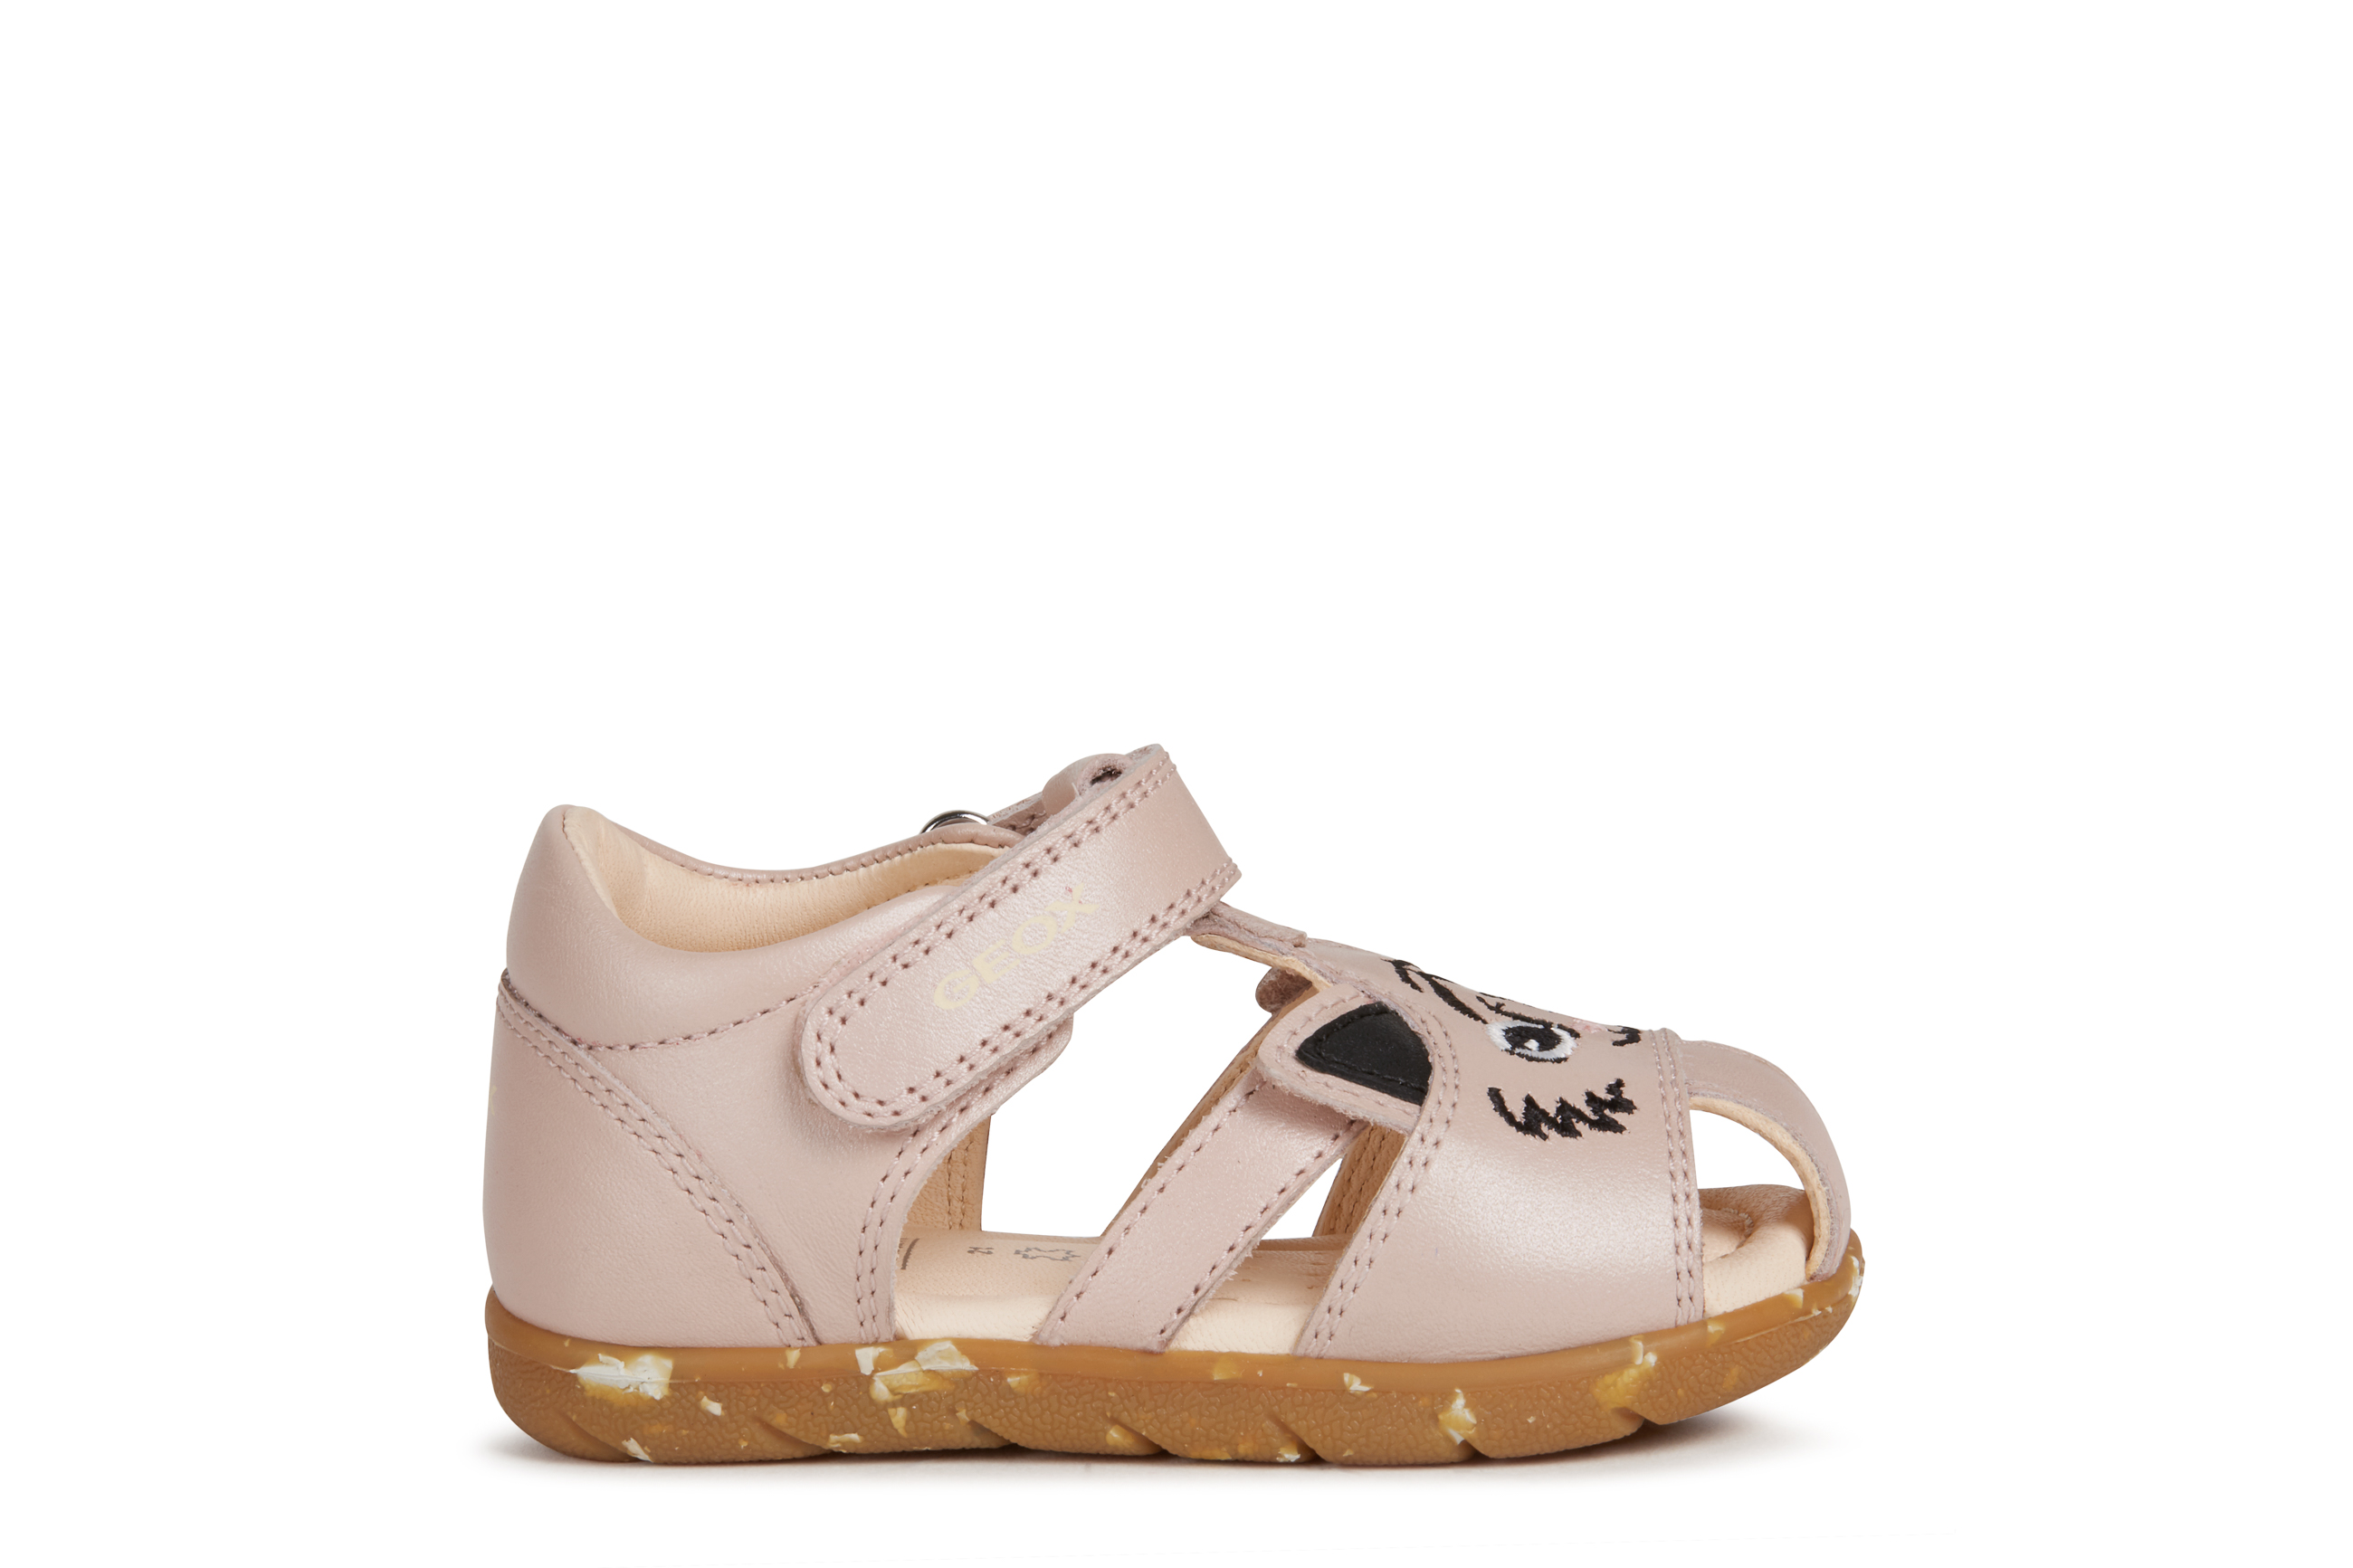 GEOX 携手WWF(世界自然基金会)推出2020春夏儿童鞋履胶囊系列